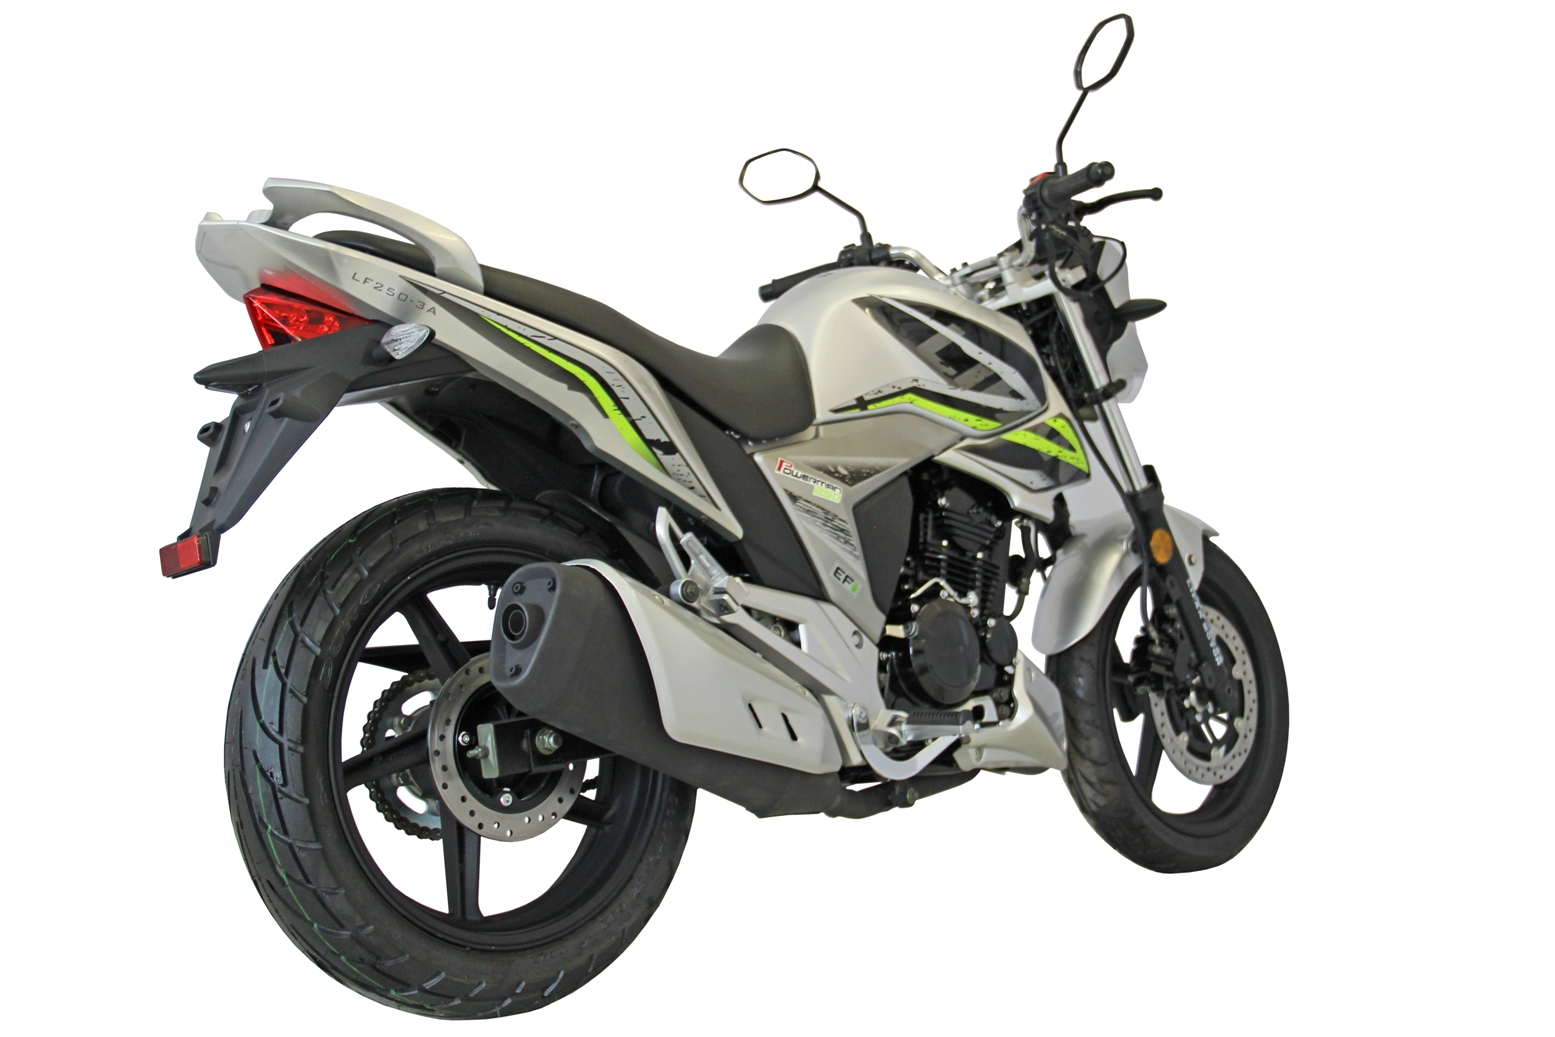 МОТОЦИКЛ LIFAN LF250-3A  Grey Luster  Артмото - купить квадроцикл в украине и харькове, мотоцикл, снегоход, скутер, мопед, электромобиль